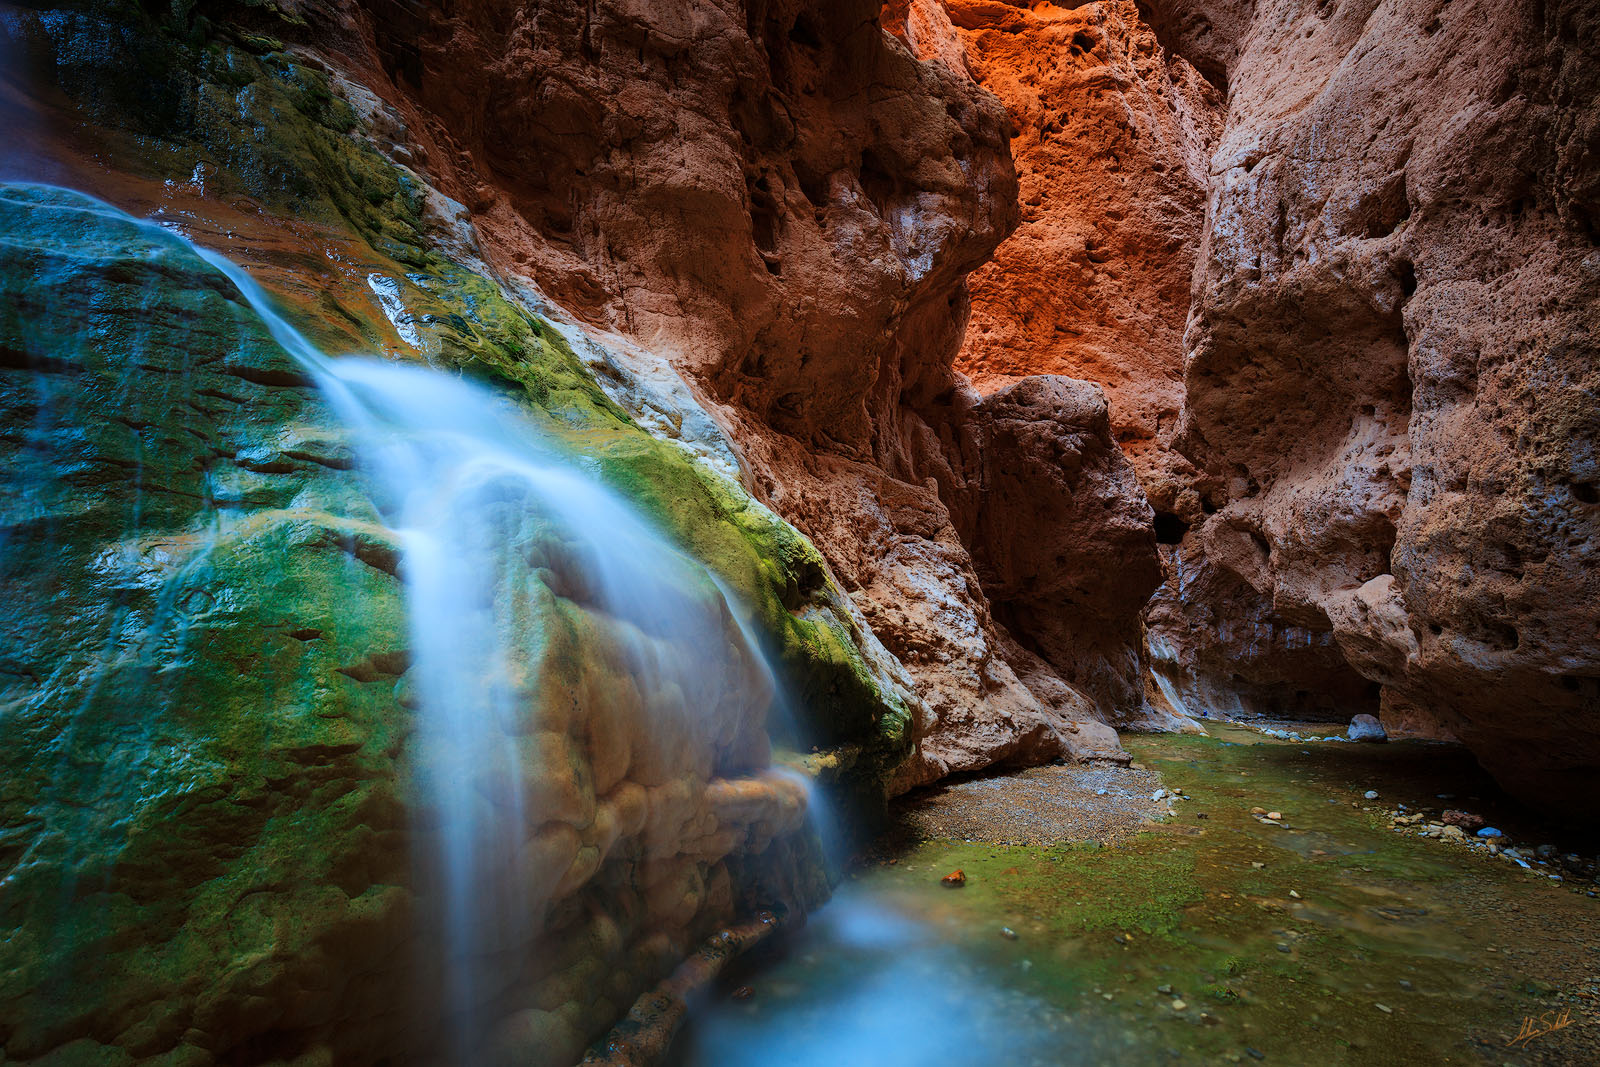 AZ, Arizona, Diamond Down, Grand Canyon, Grand Canyon National Park, Hualapai, National Park, Travertine Canyon, Travertine Falls, Waterfall, photo